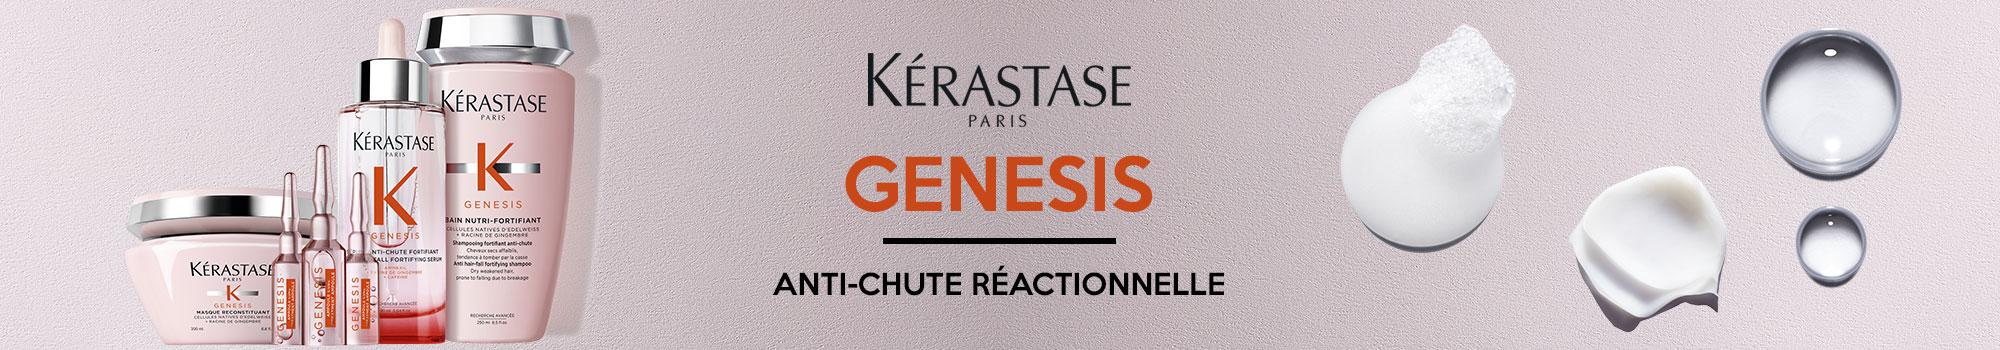 Kérastase Genesis